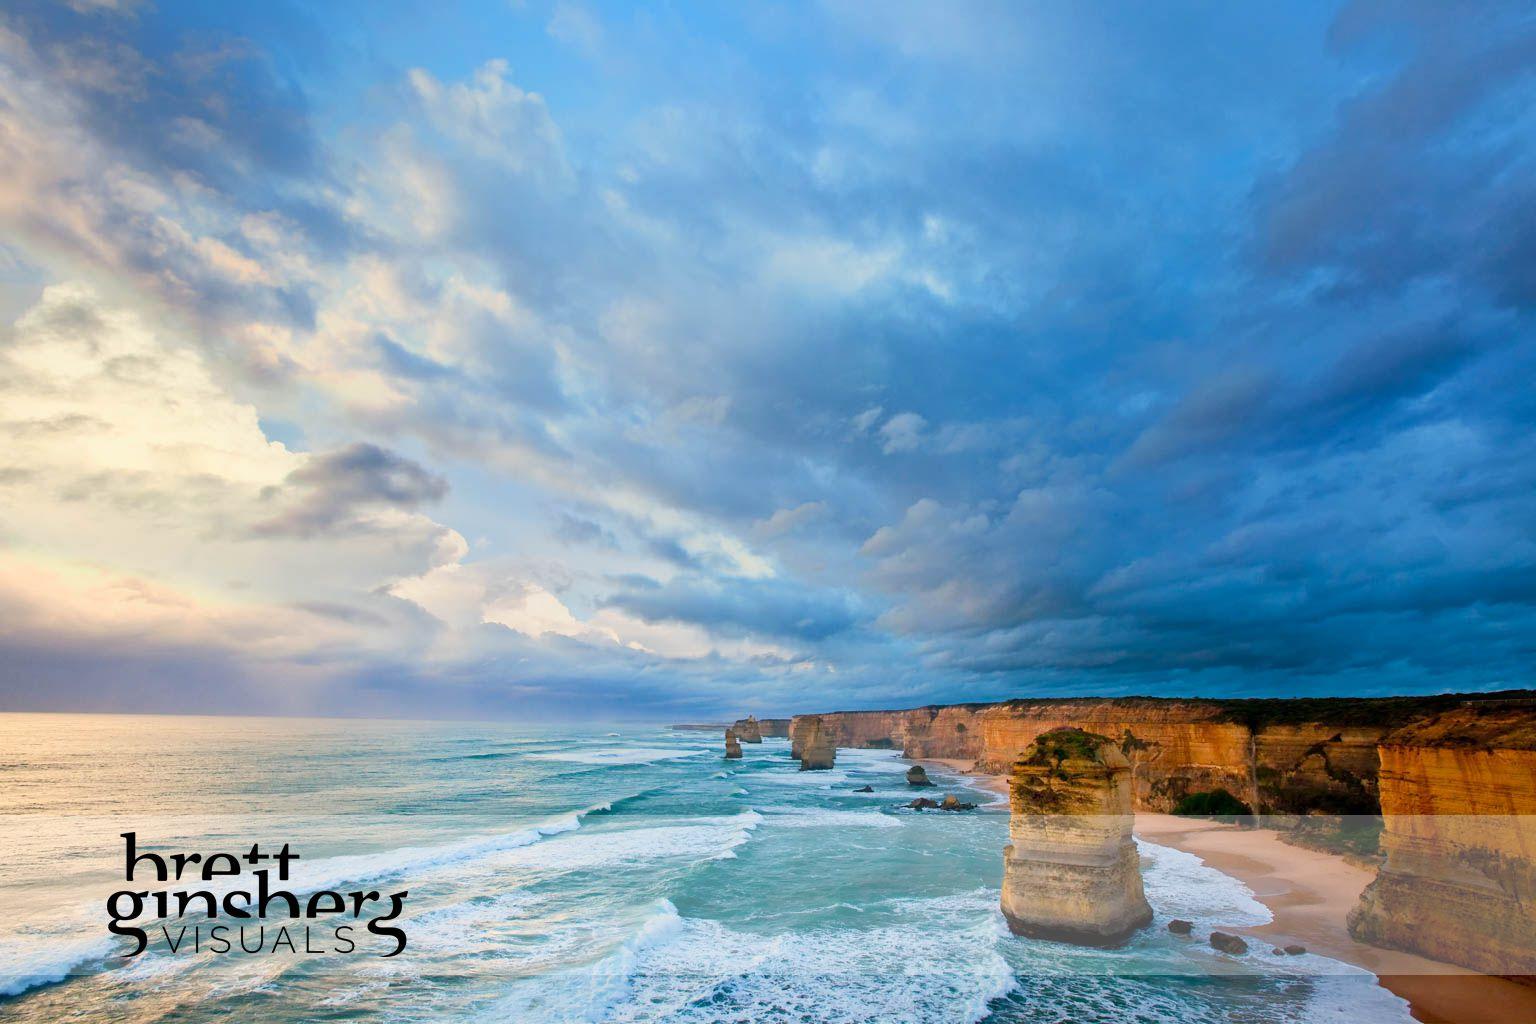 melbourne great ocean road 12 apostles